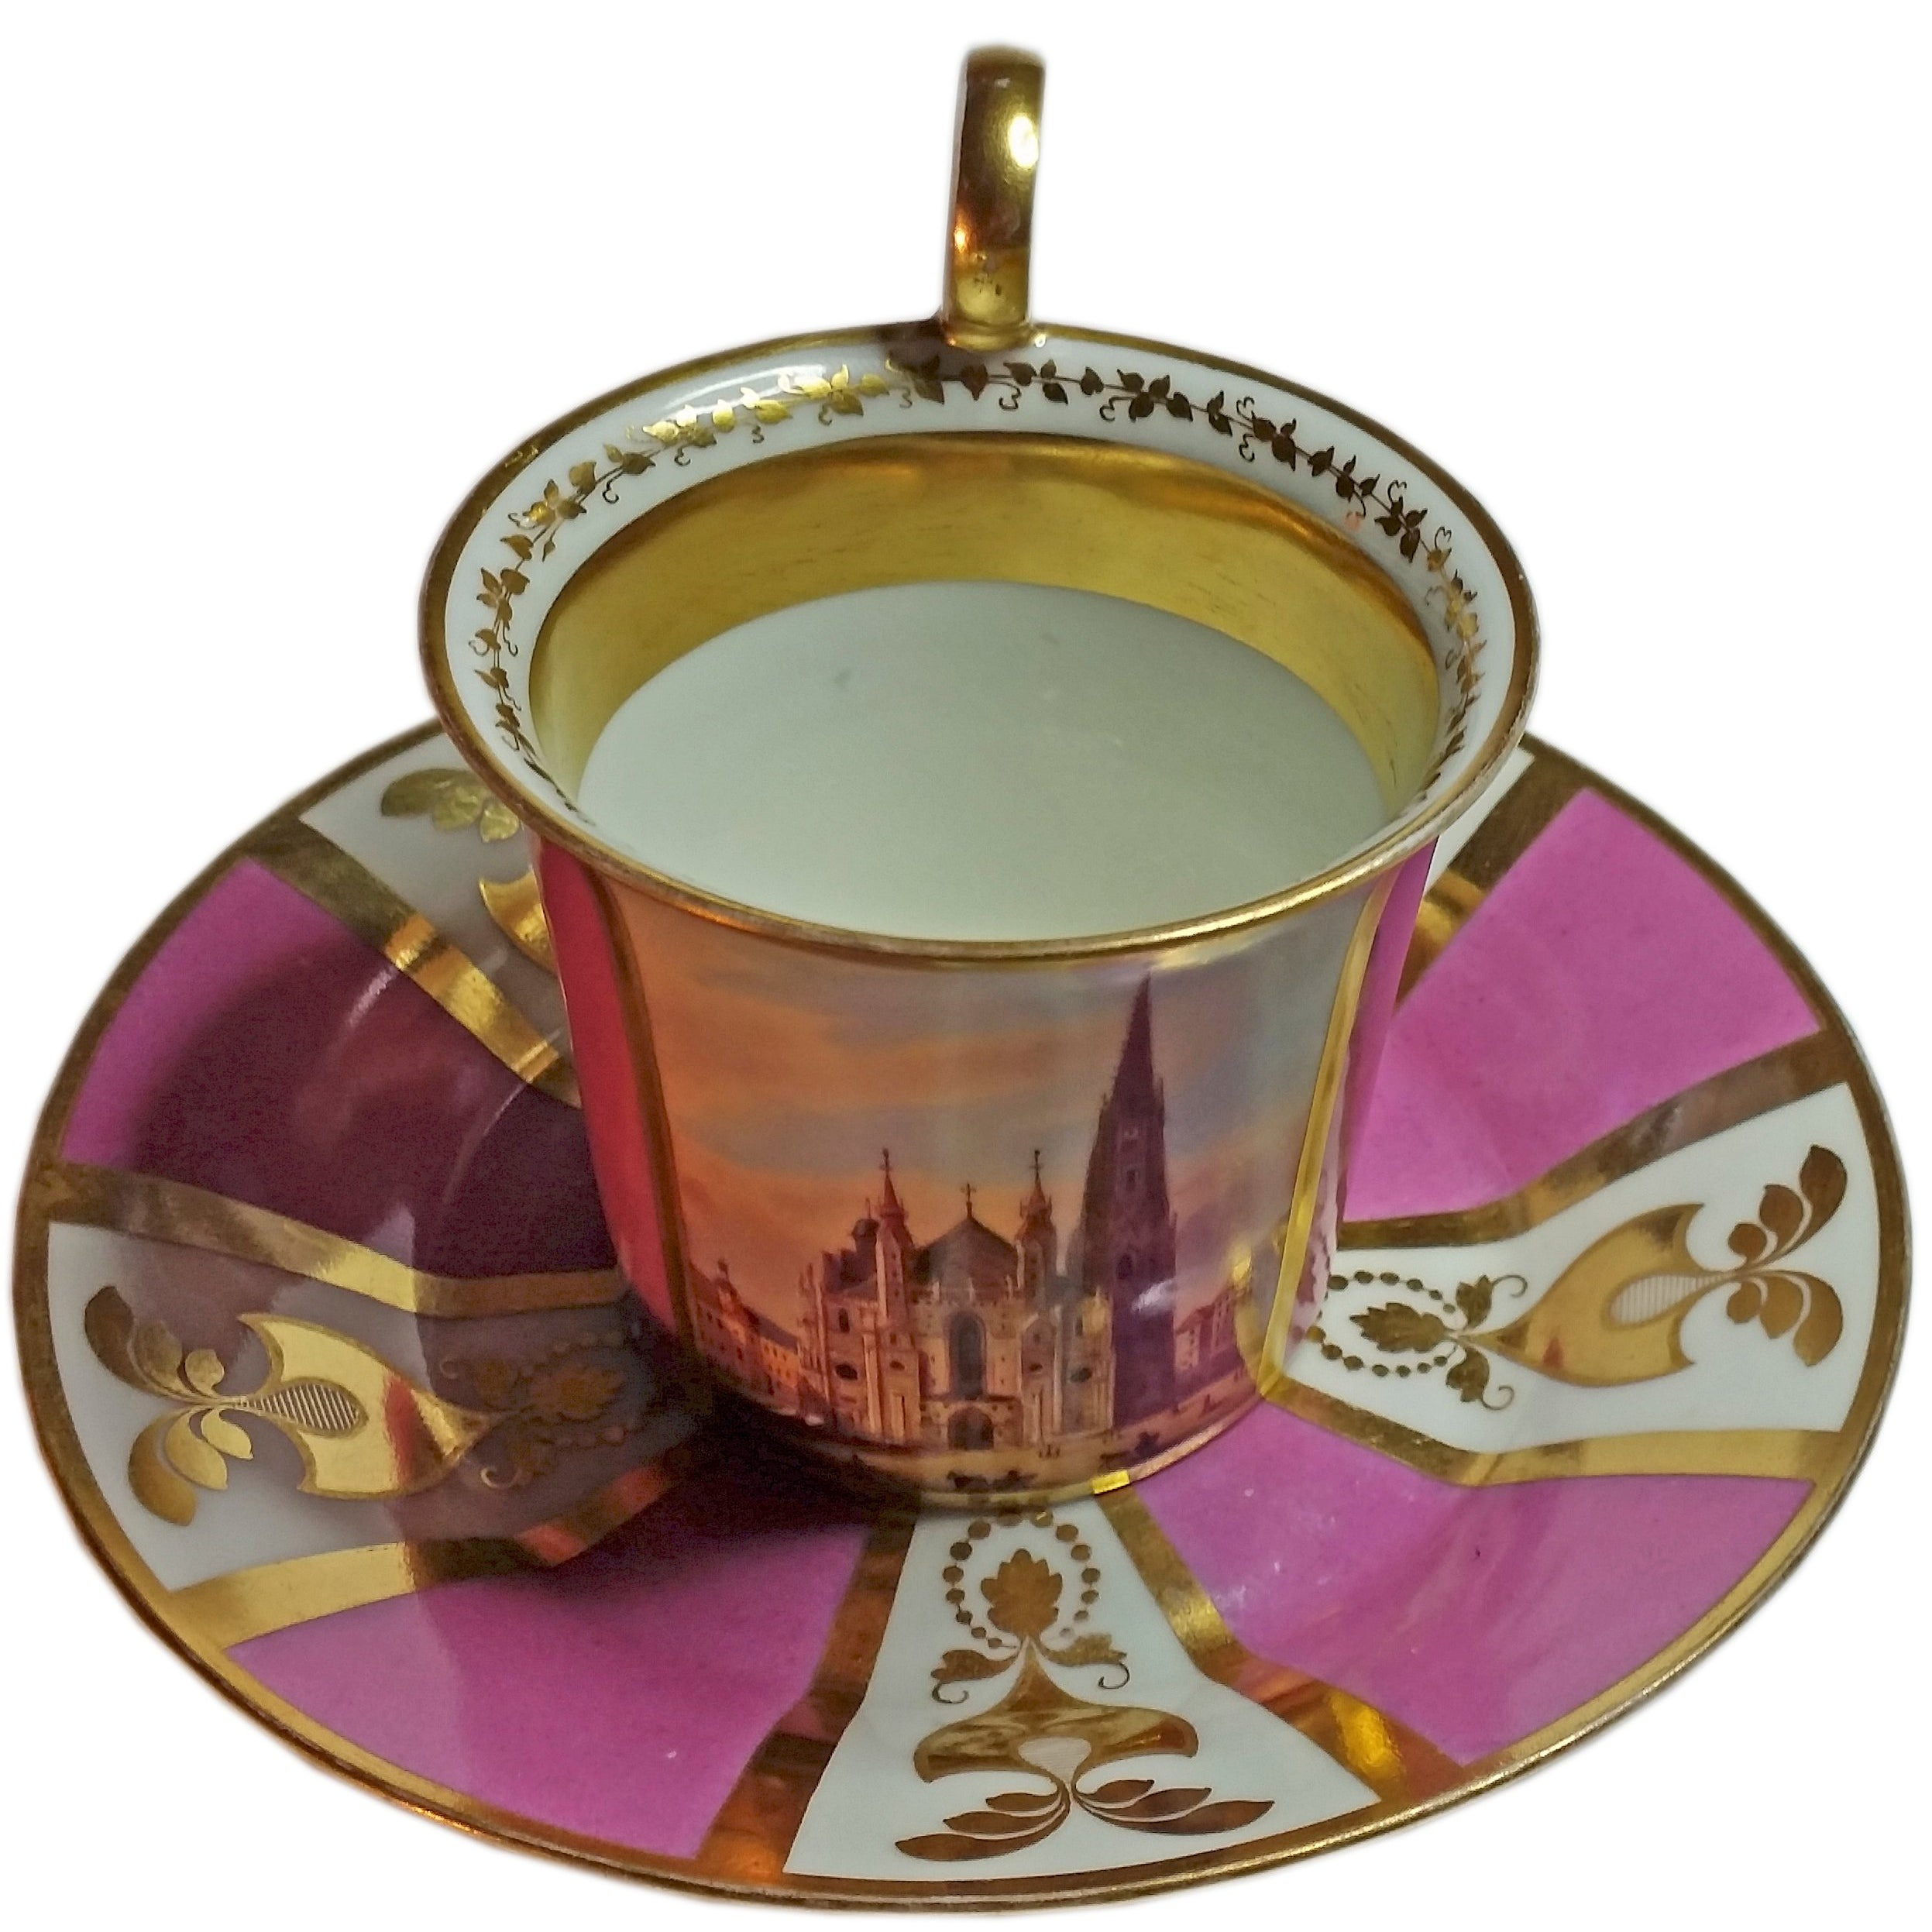 Vienna Imperial Porcelain Cup Saucer Saint Stephen's Cathedral Austria, 1821